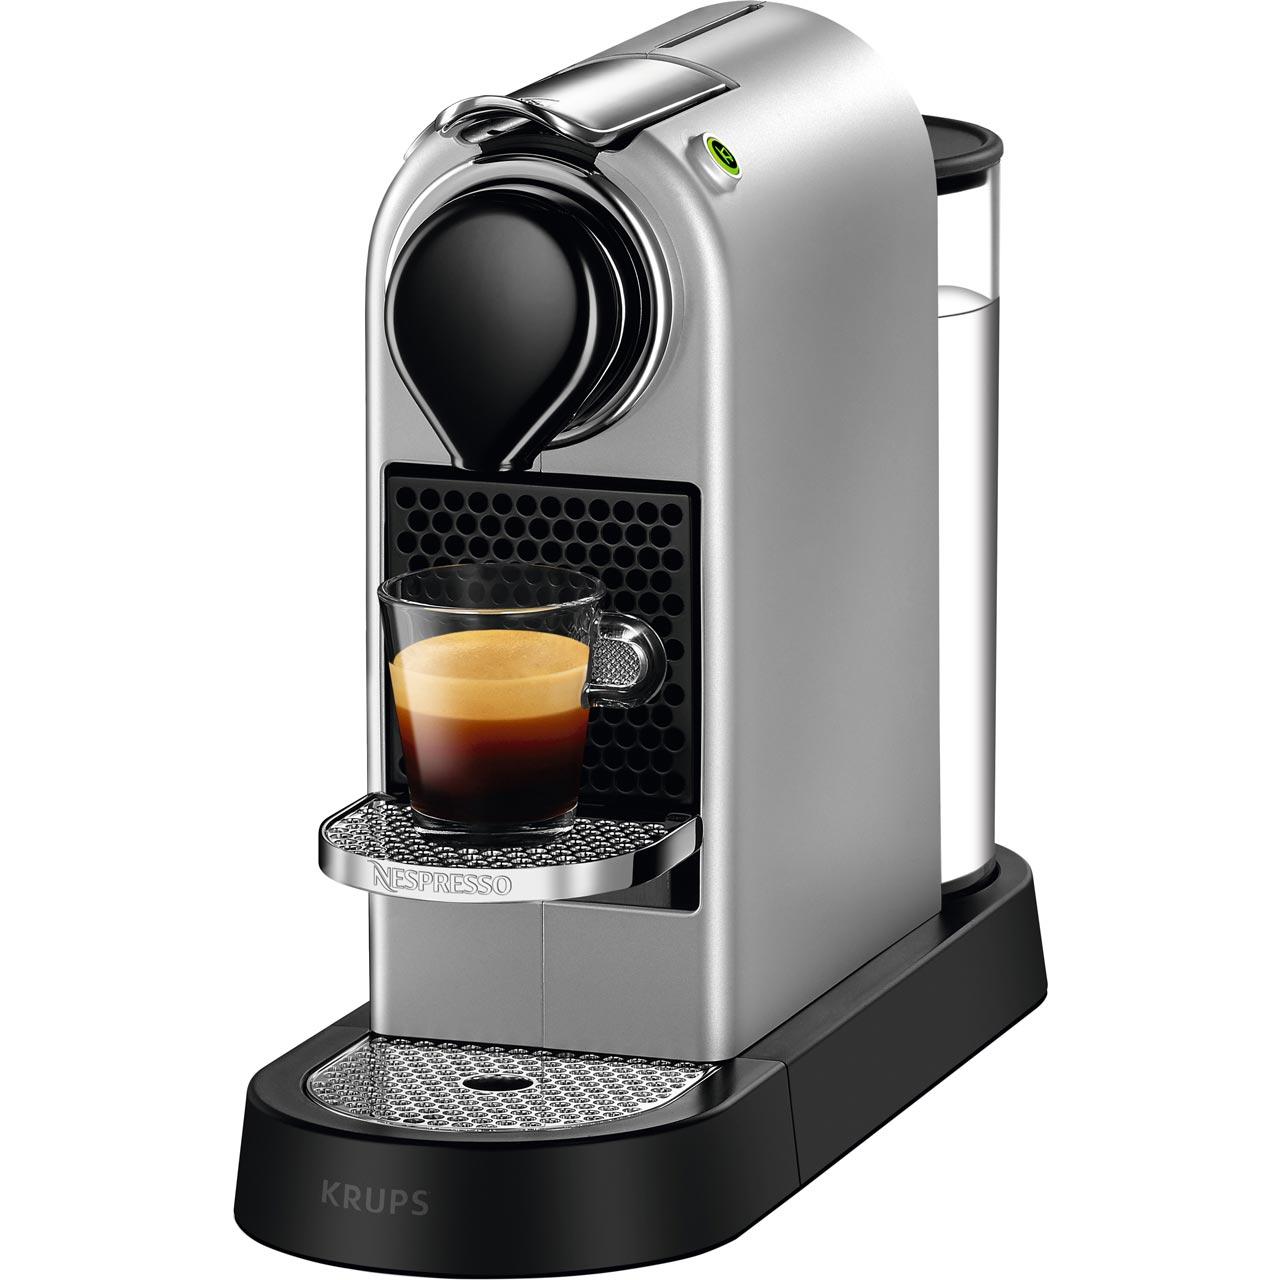 nespresso by krups xn740b40 pod coffee machine 1260 watt. Black Bedroom Furniture Sets. Home Design Ideas